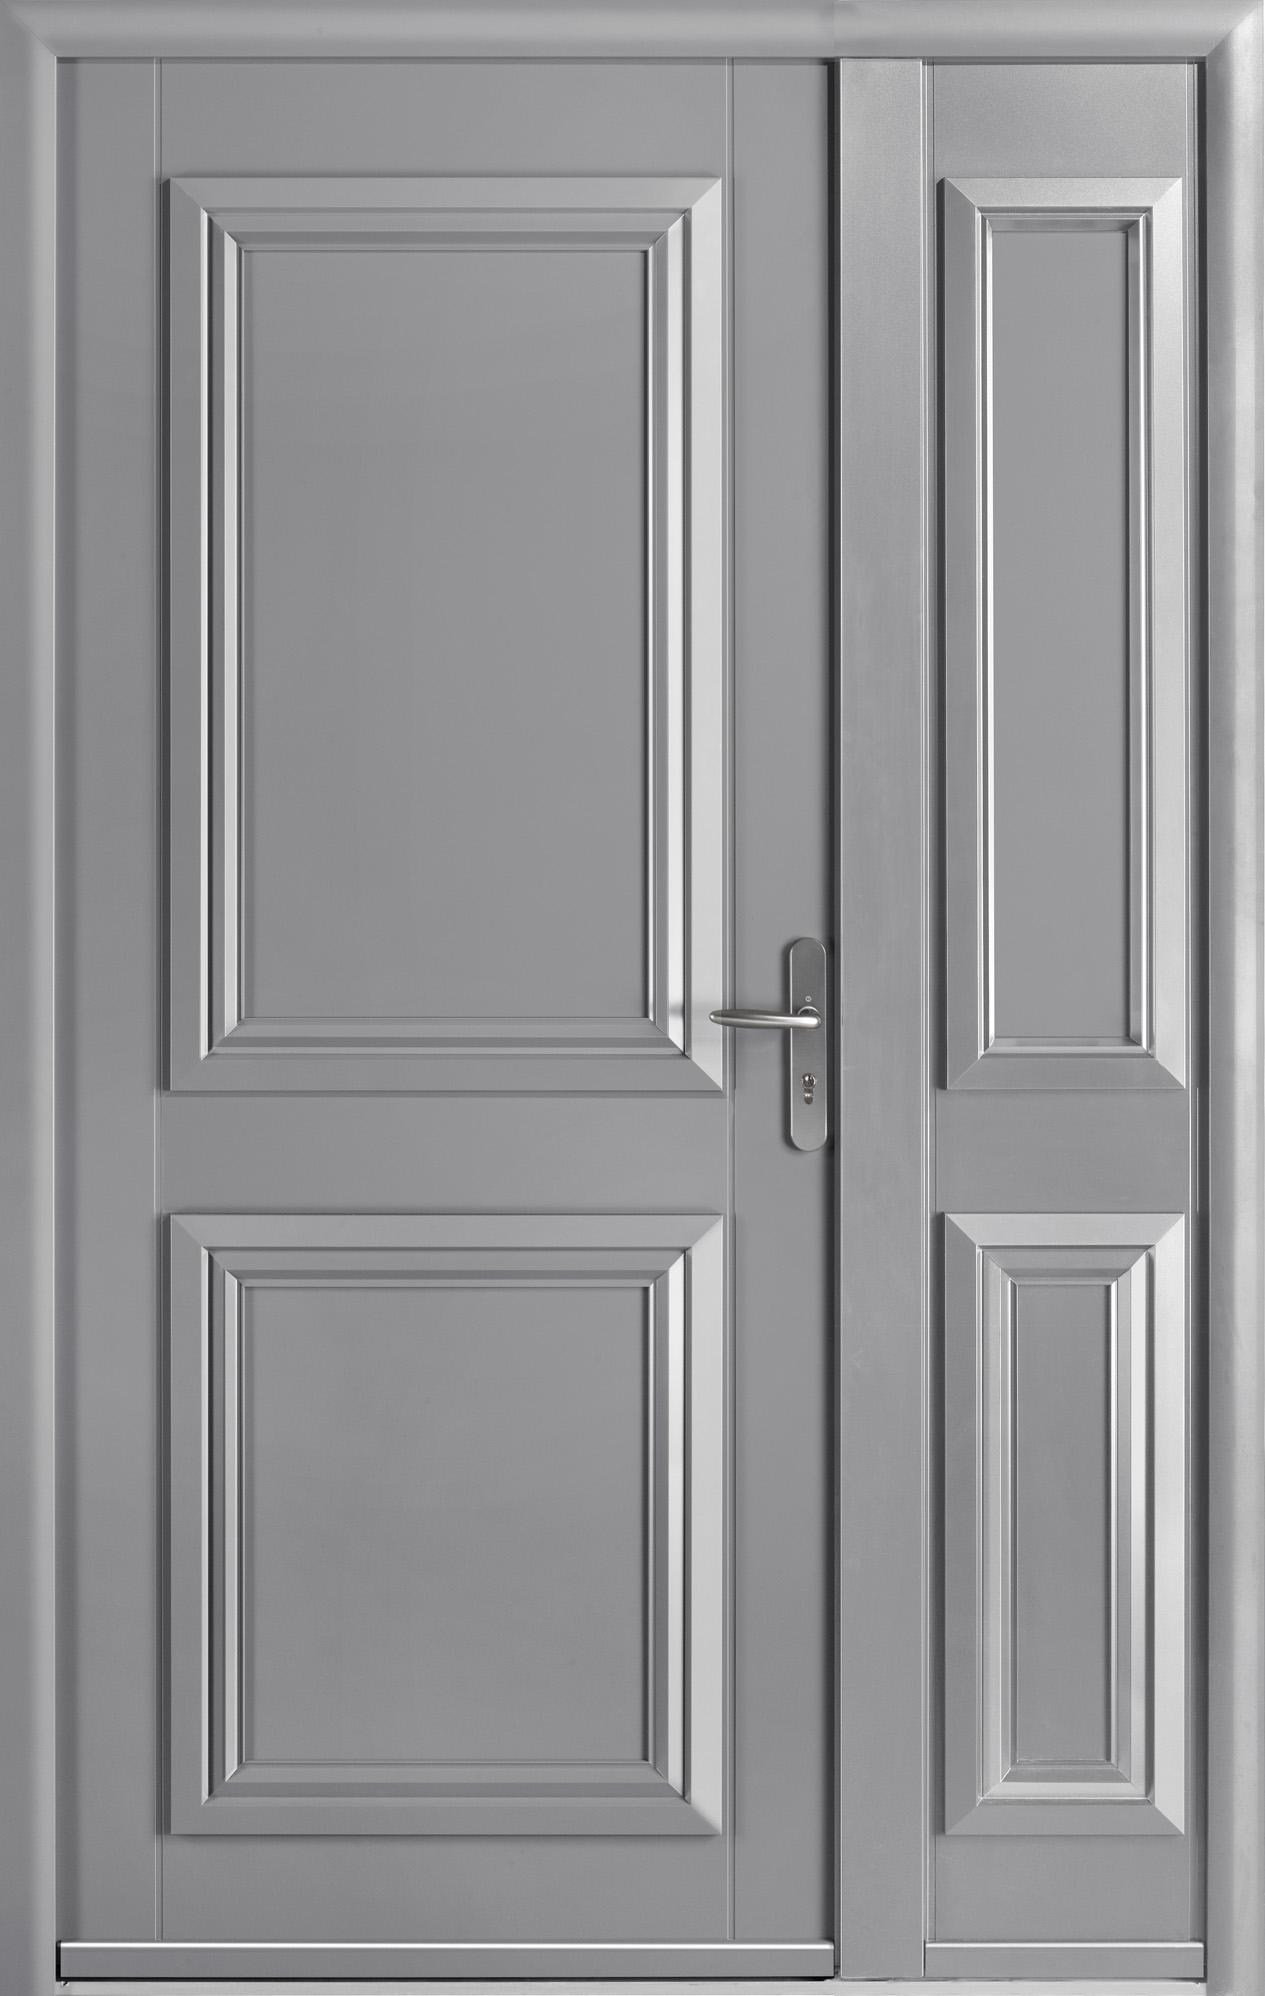 Portes Dentrée Aluminium MERLIN SWAO - Porte en aluminium